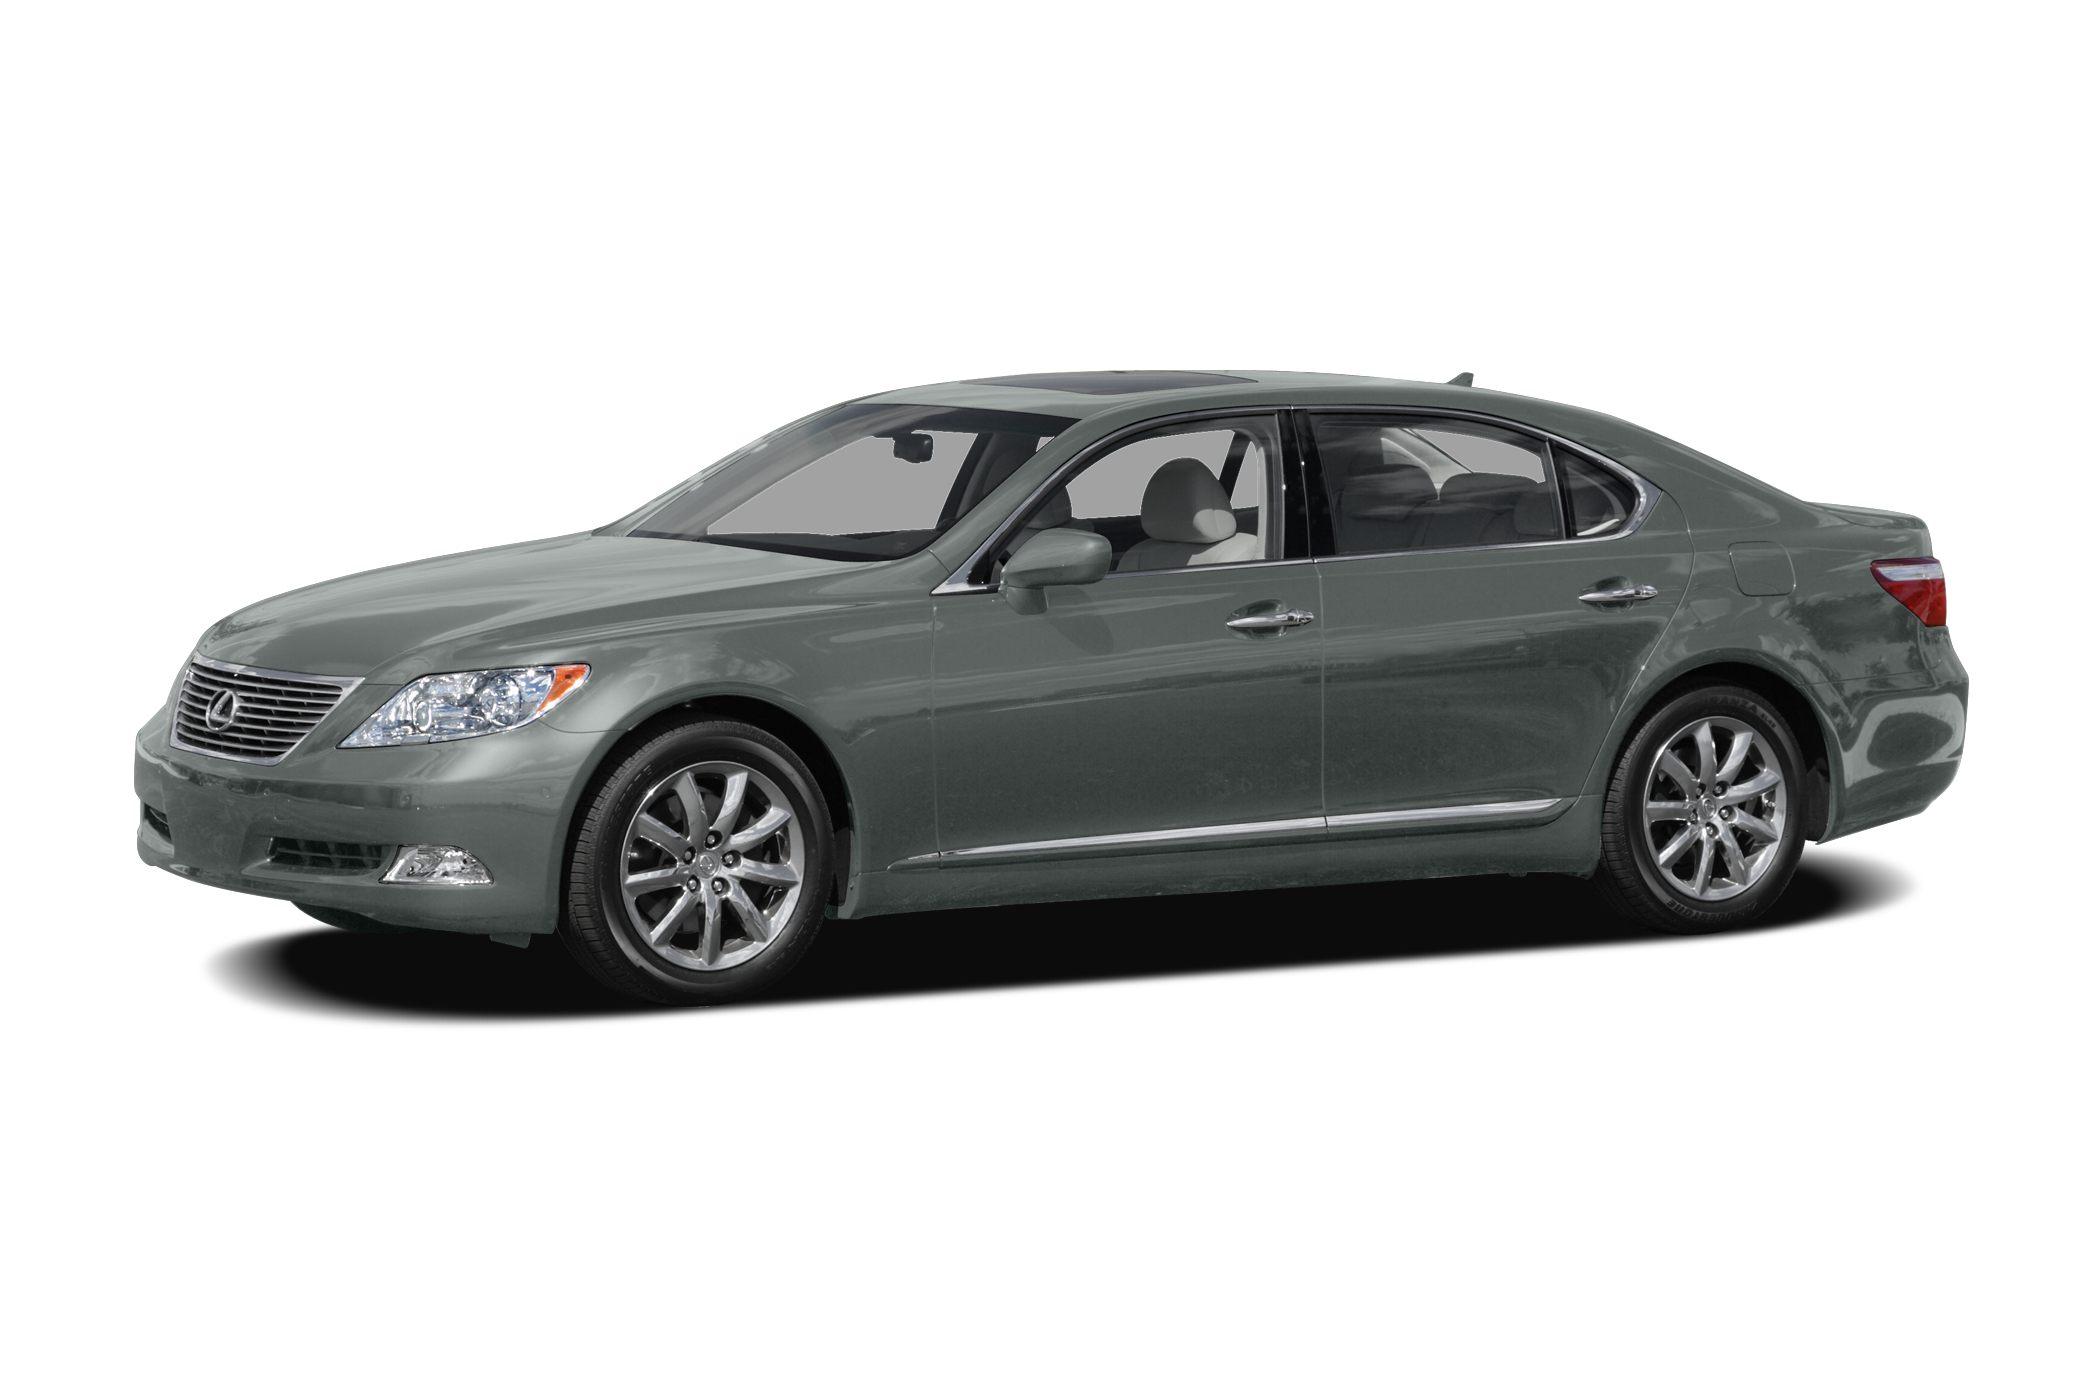 2007 Lexus LS 460 L Miles 72922Color Silver Stock 18102 VIN JTHGL46F775016880